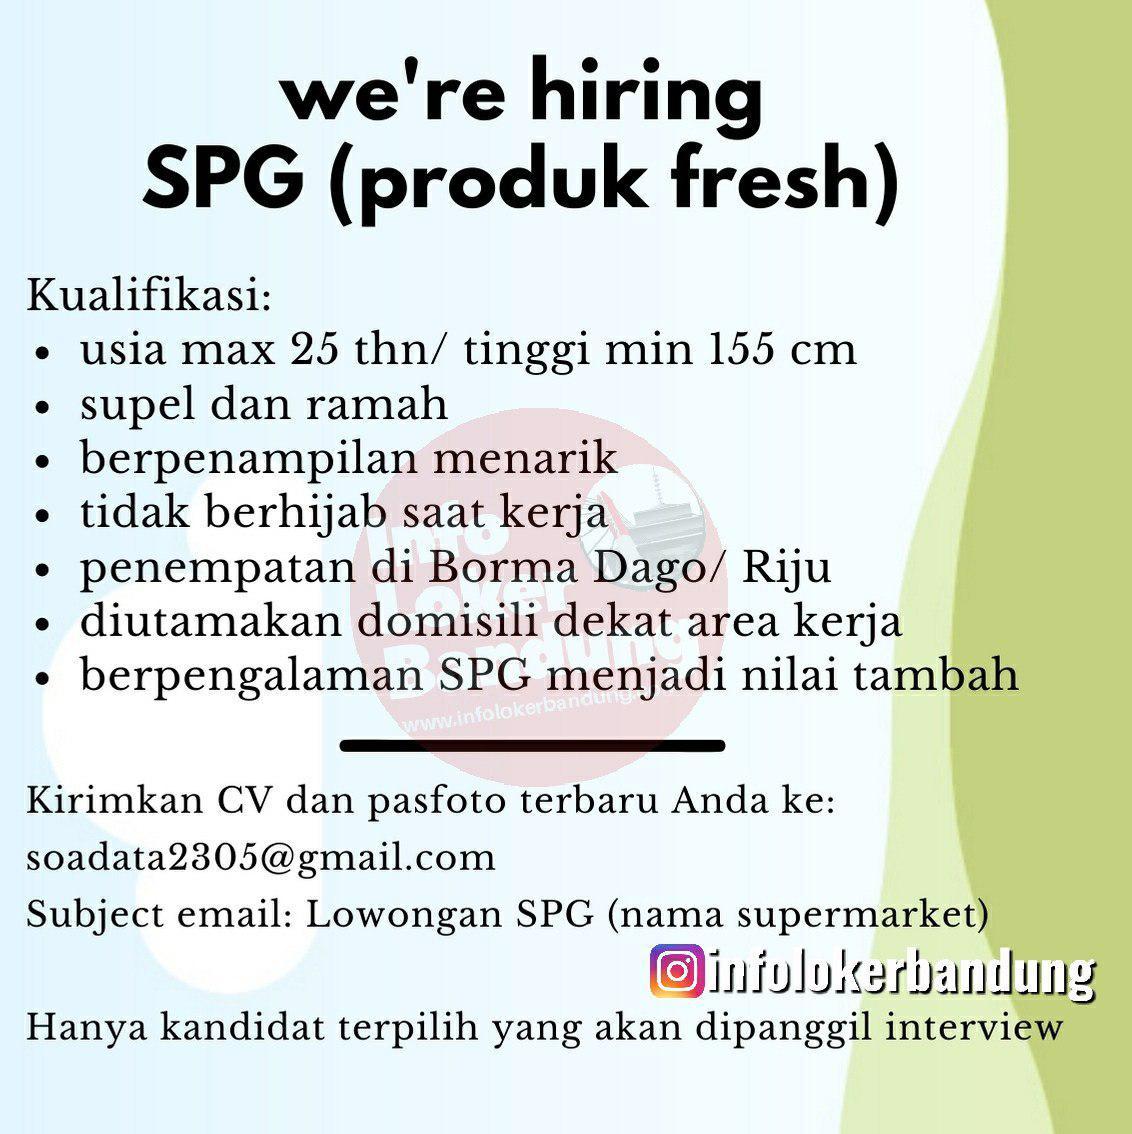 Lowongan SPG Produk Fresh Penempatan Riau Junction & Borma Dago Bandung Januari 2020